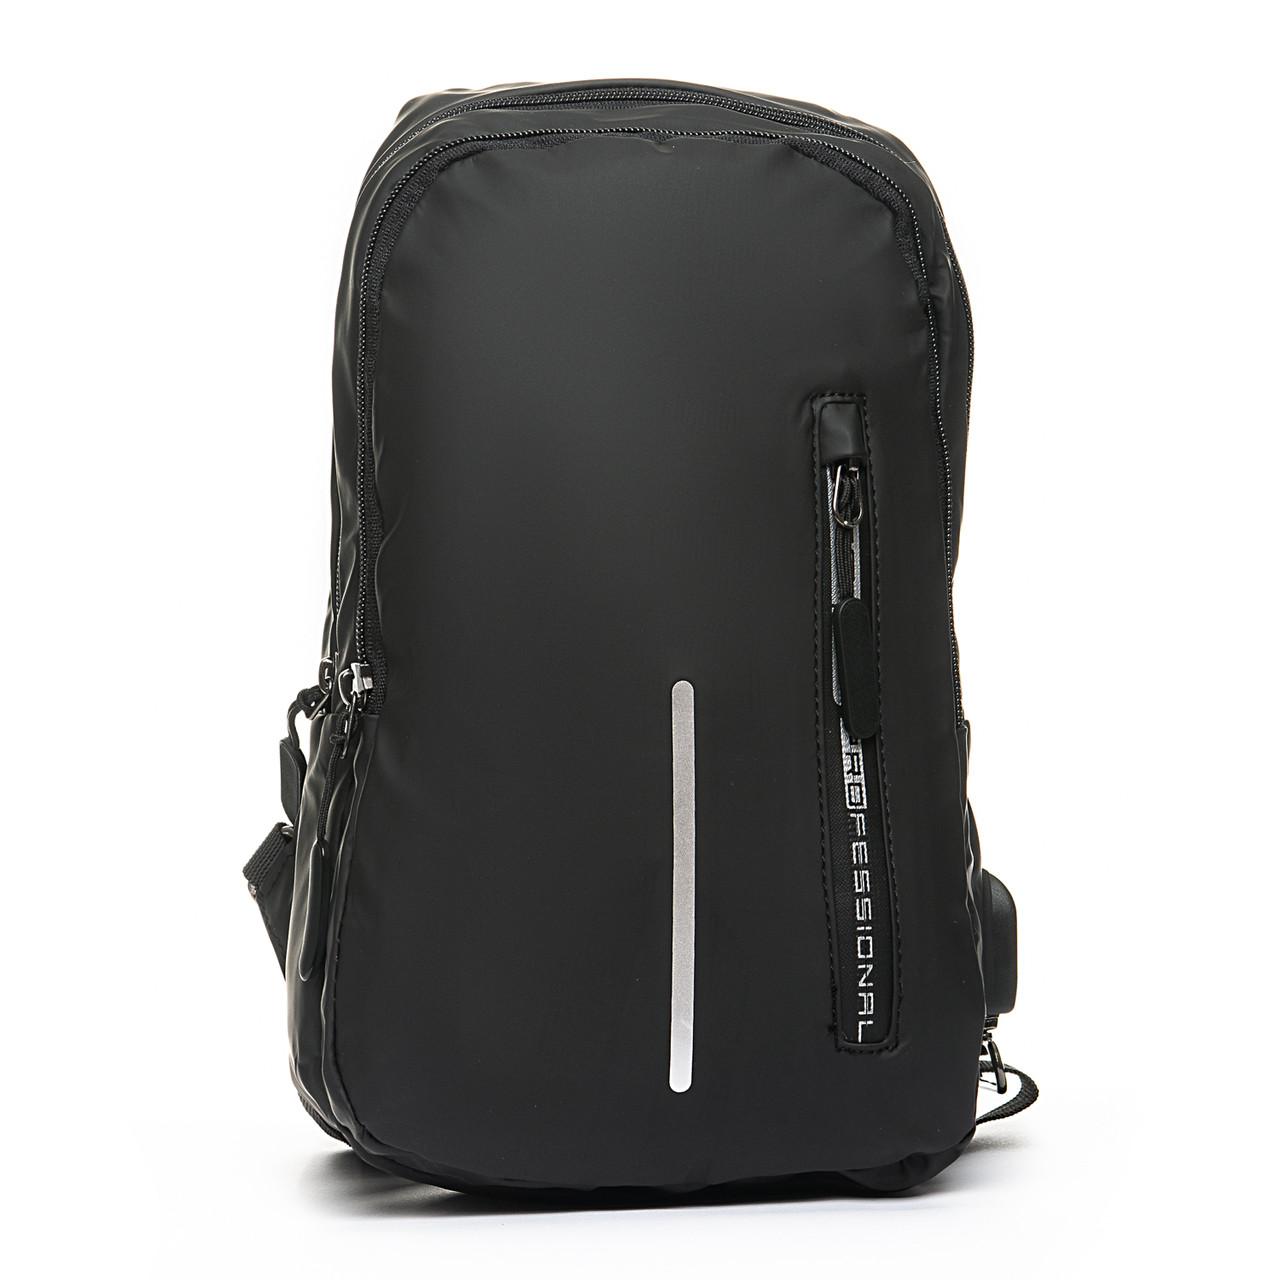 Мужская сумка через плече Lanpad 18 x 30 x 10 см Черный (6281/1)